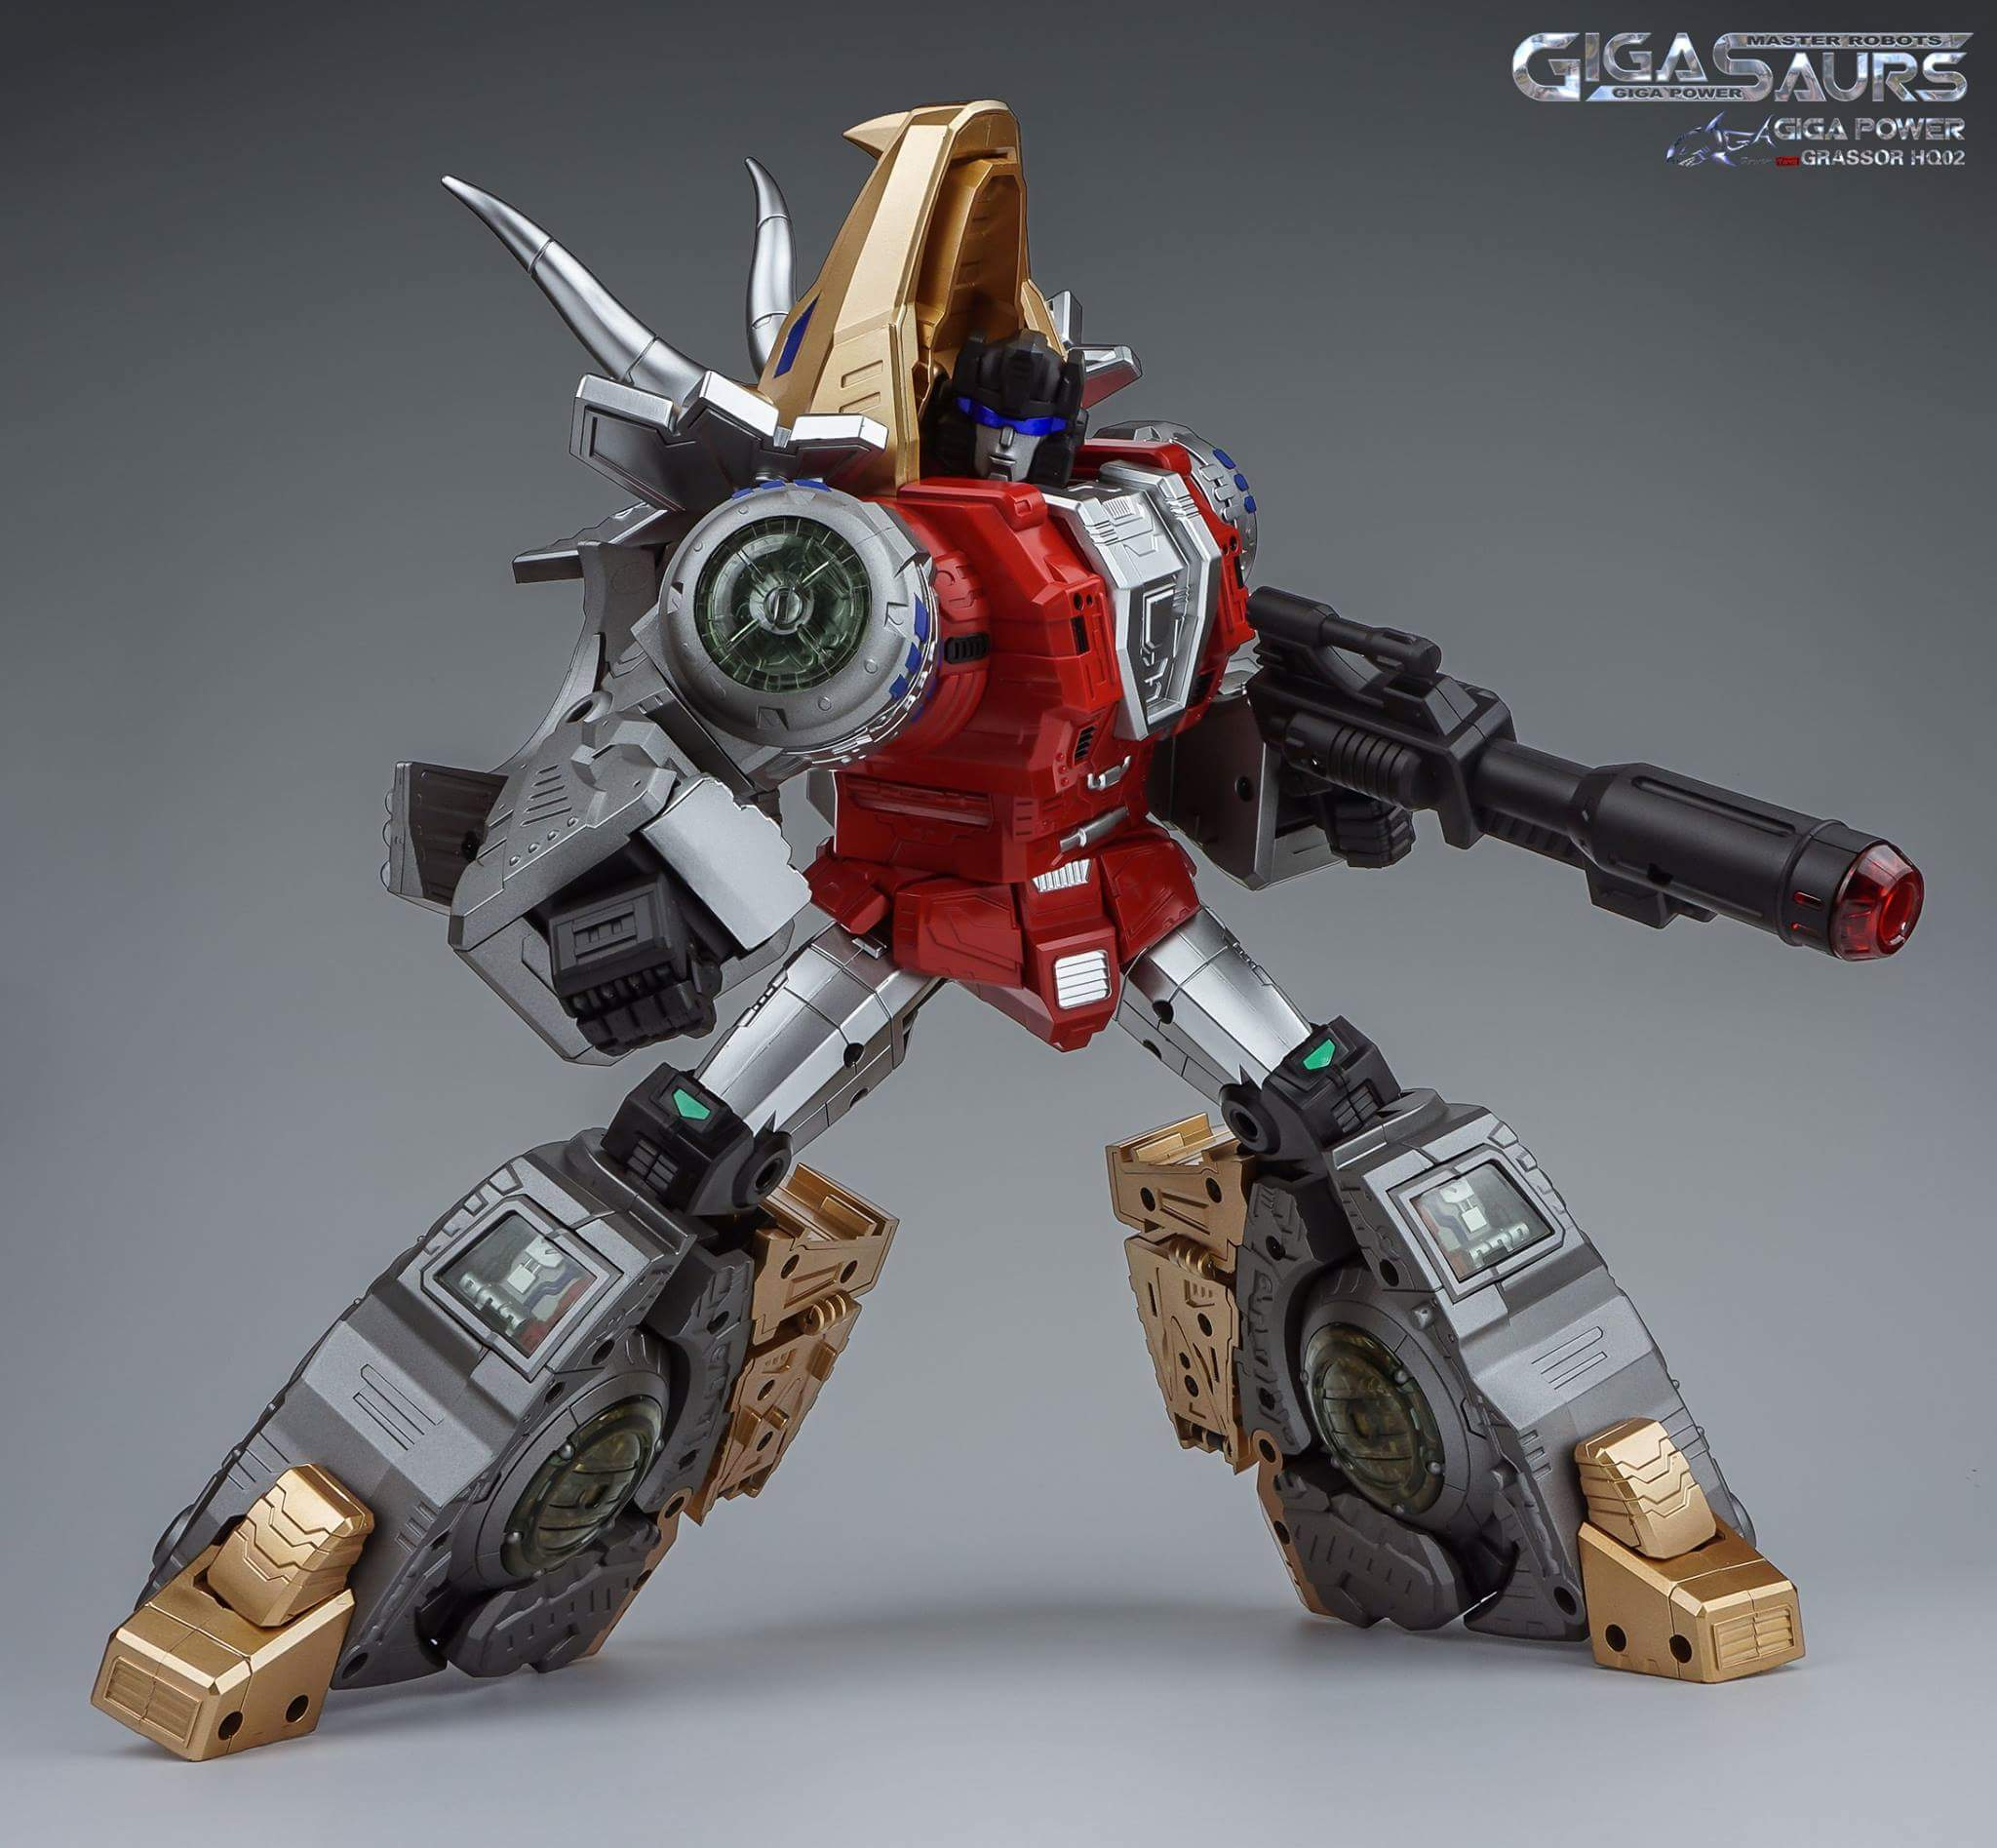 [GigaPower] Produit Tiers - Jouets HQ-01 Superator + HQ-02 Grassor + HQ-03 Guttur + HQ-04 Graviter + HQ-05 Gaudenter - aka Dinobots - Page 5 Q9Nz8wGZ